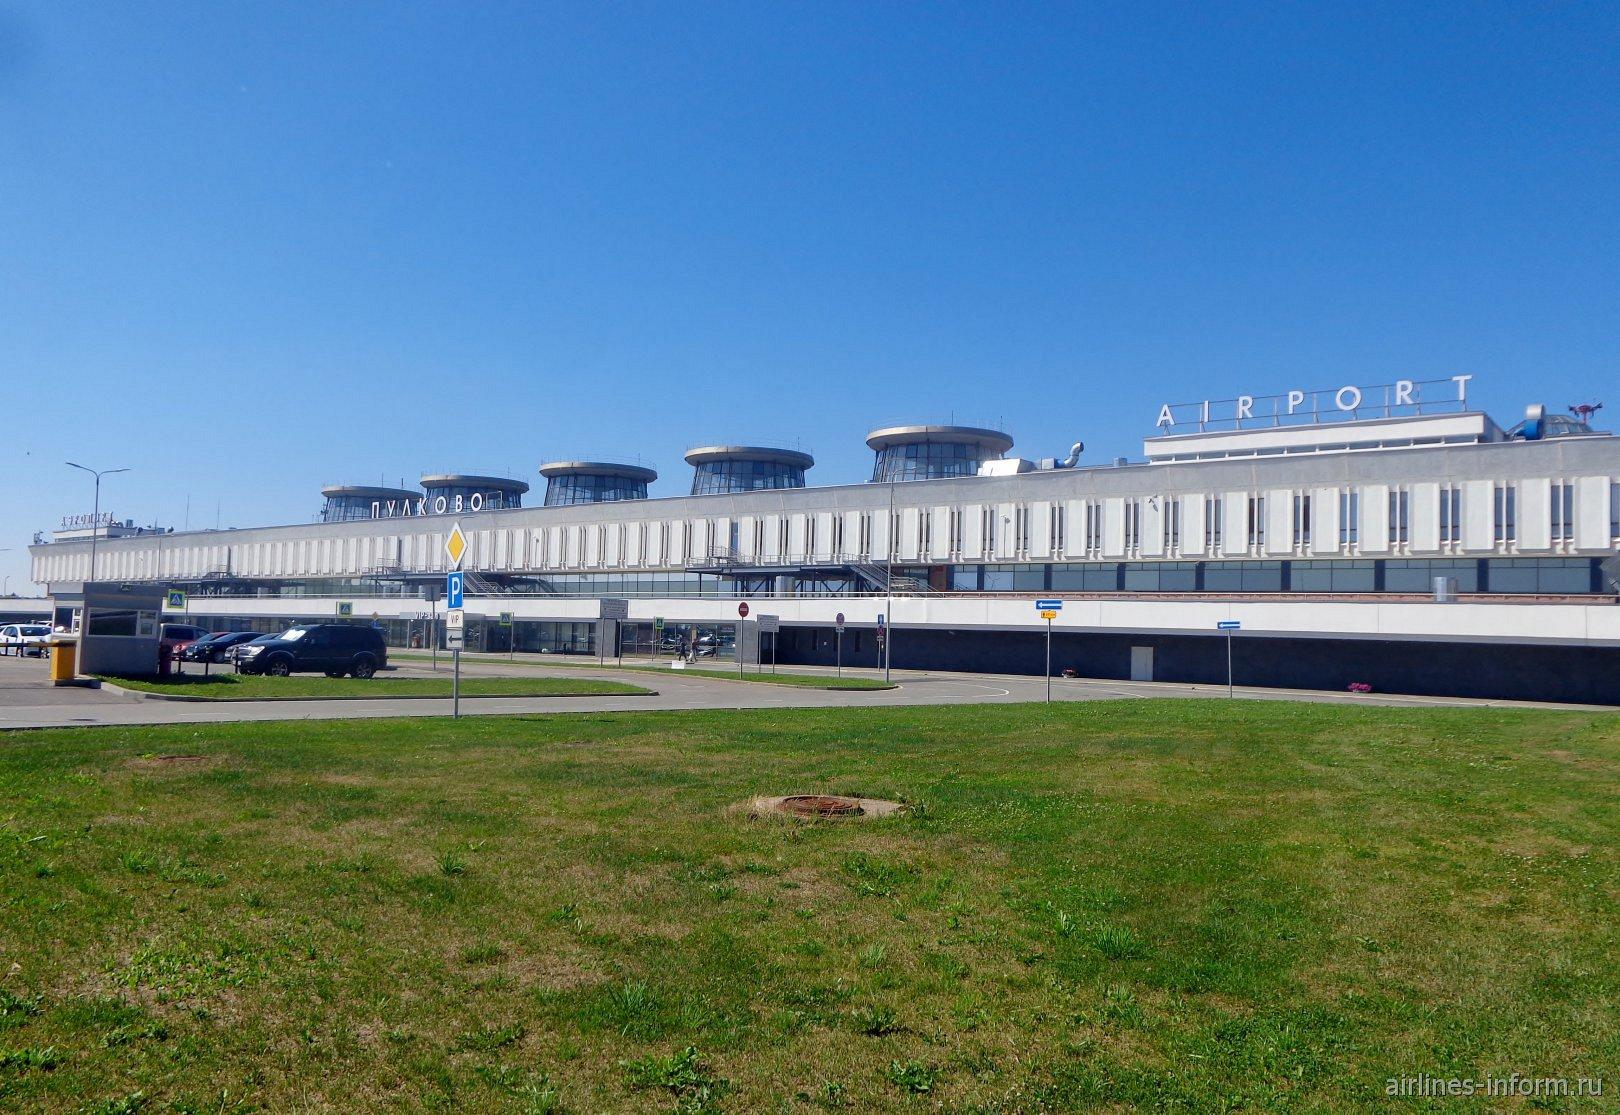 Внутренний сектор пассажирского терминала аэропорта Пулково (бывший аэровокзал Пулково-1)